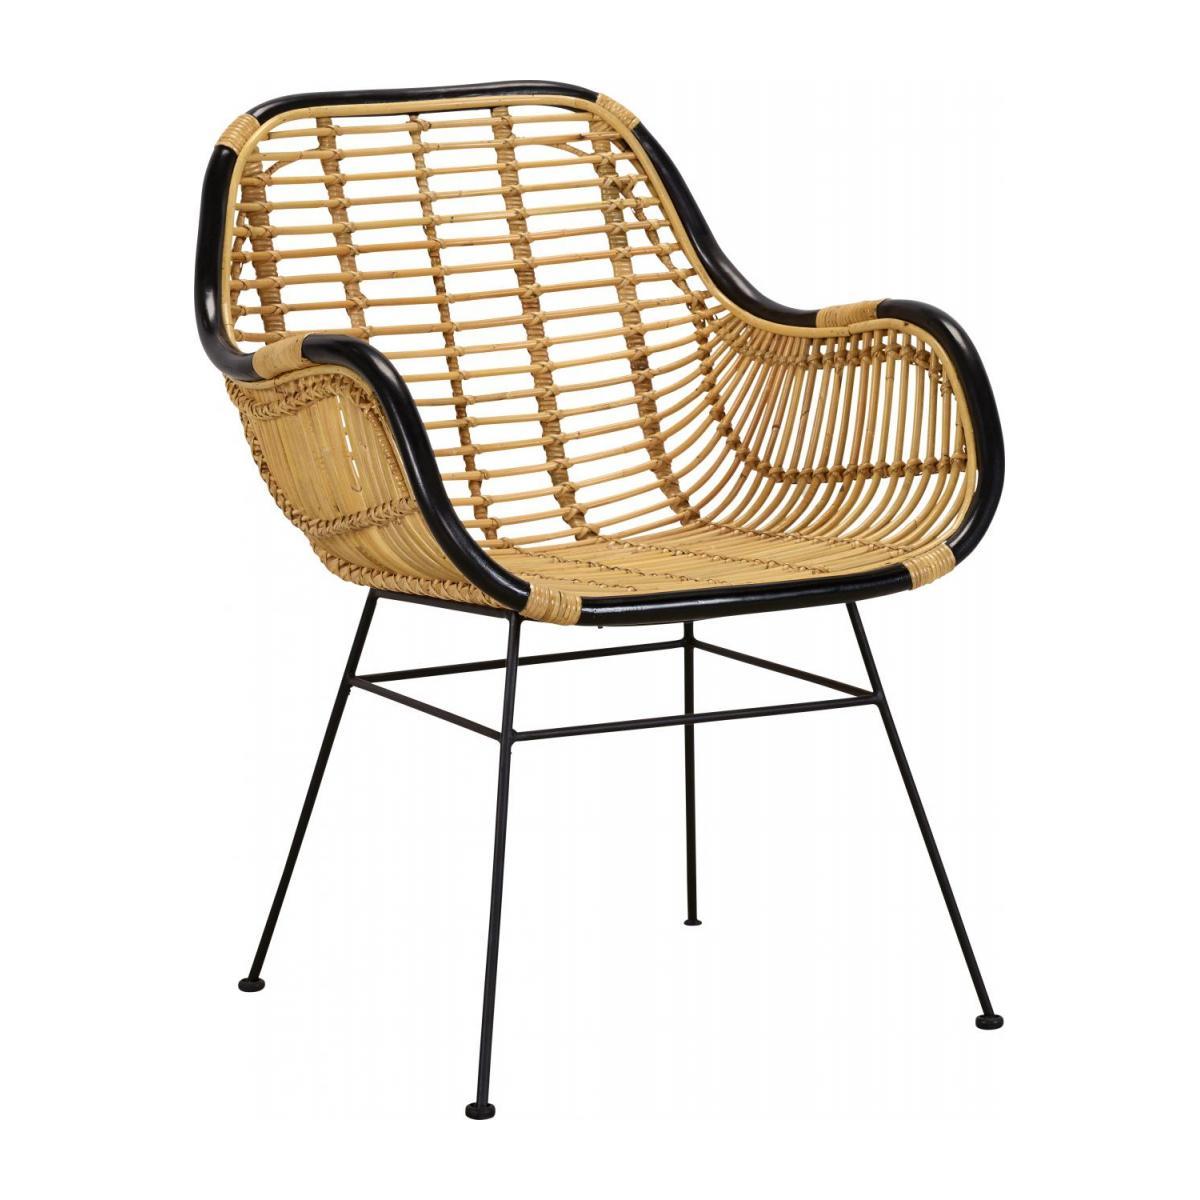 deco cuisine chaise fauteuil rotin